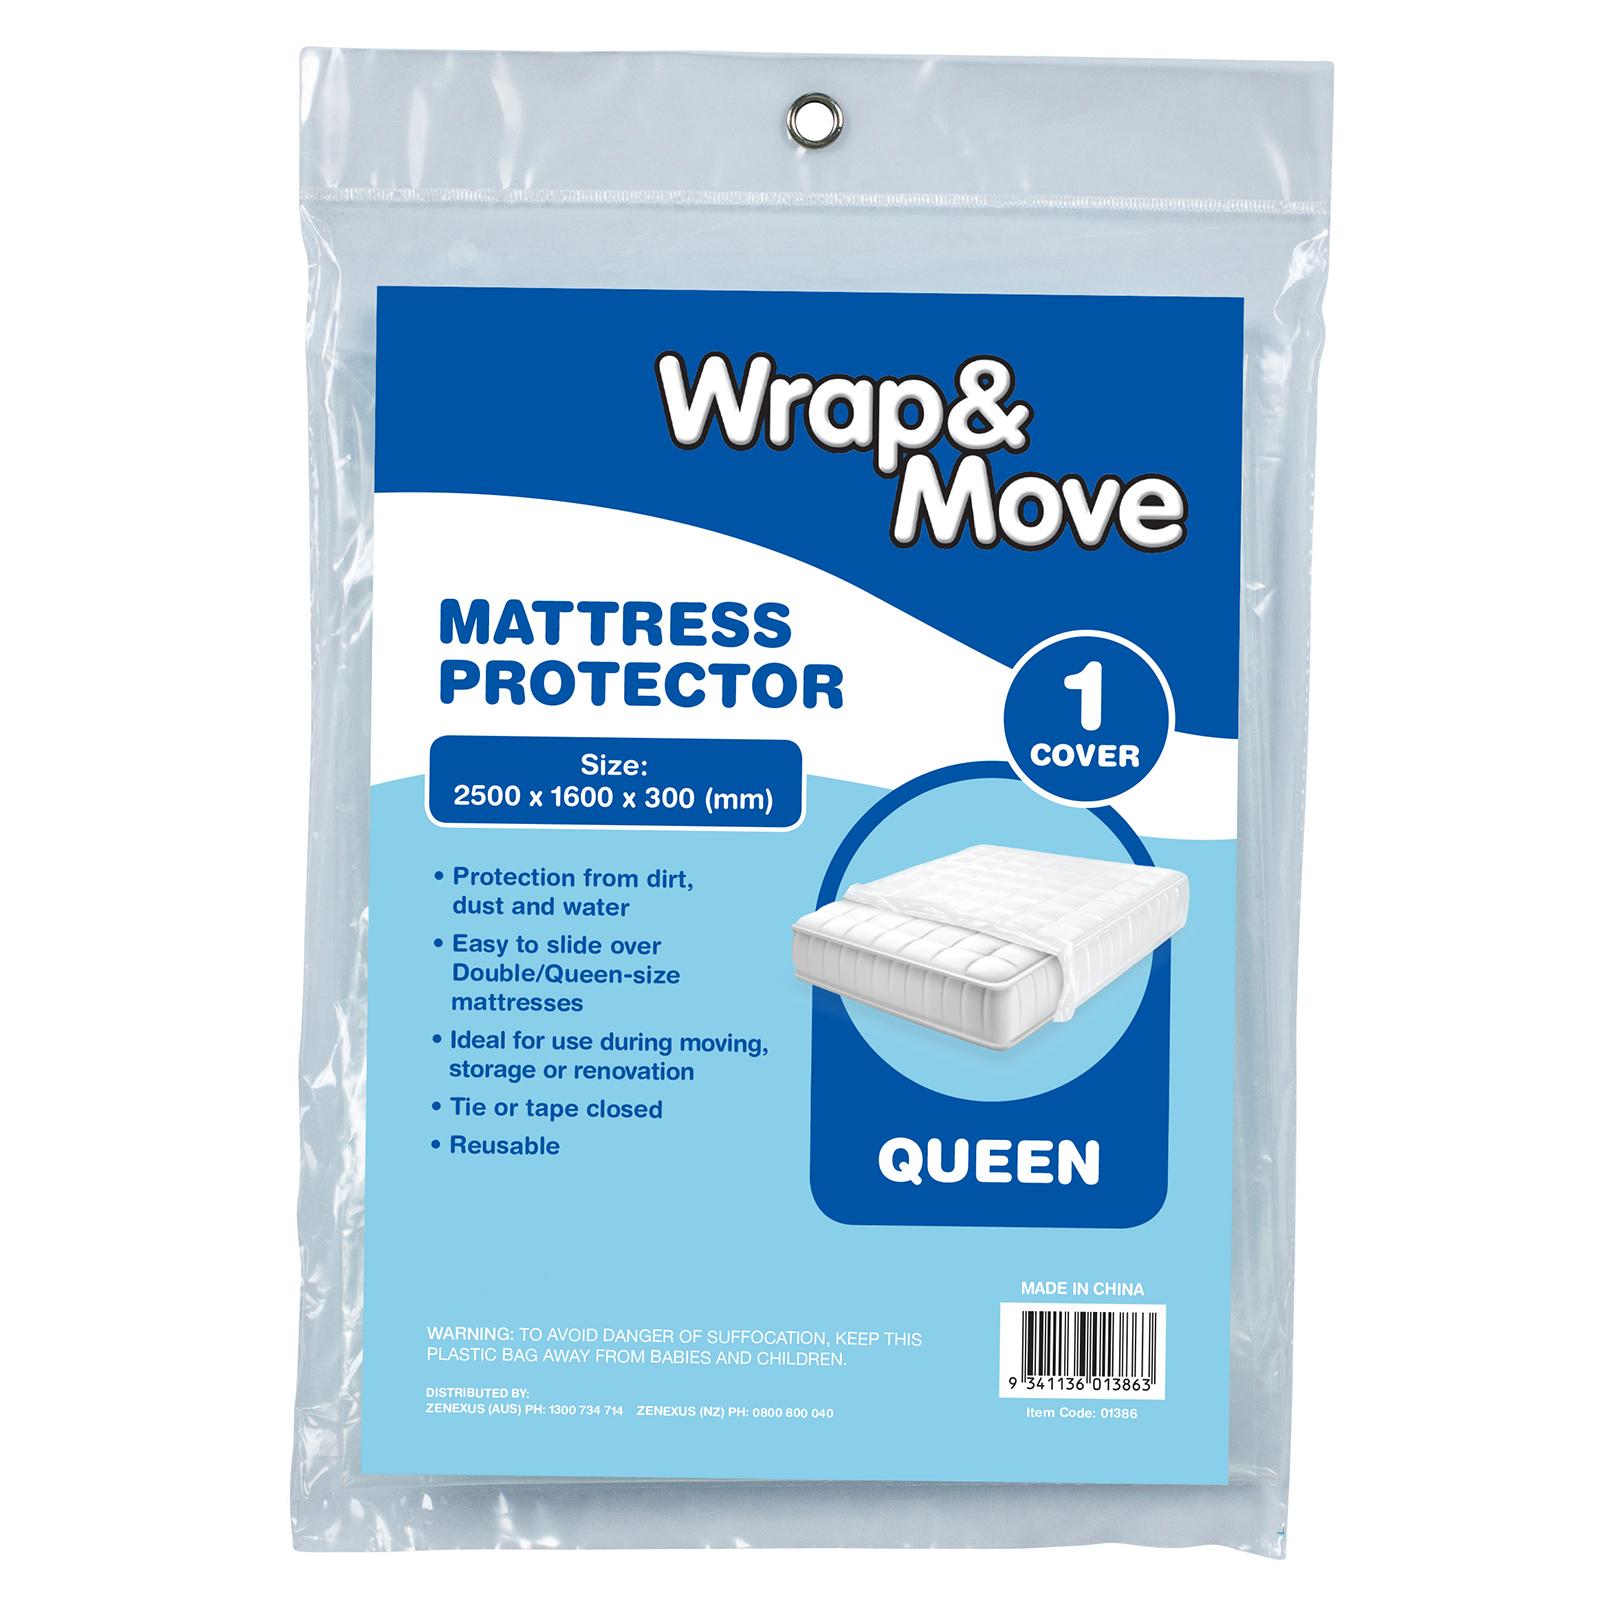 Wrap & Move Double/Queen Mattress Protector Cover